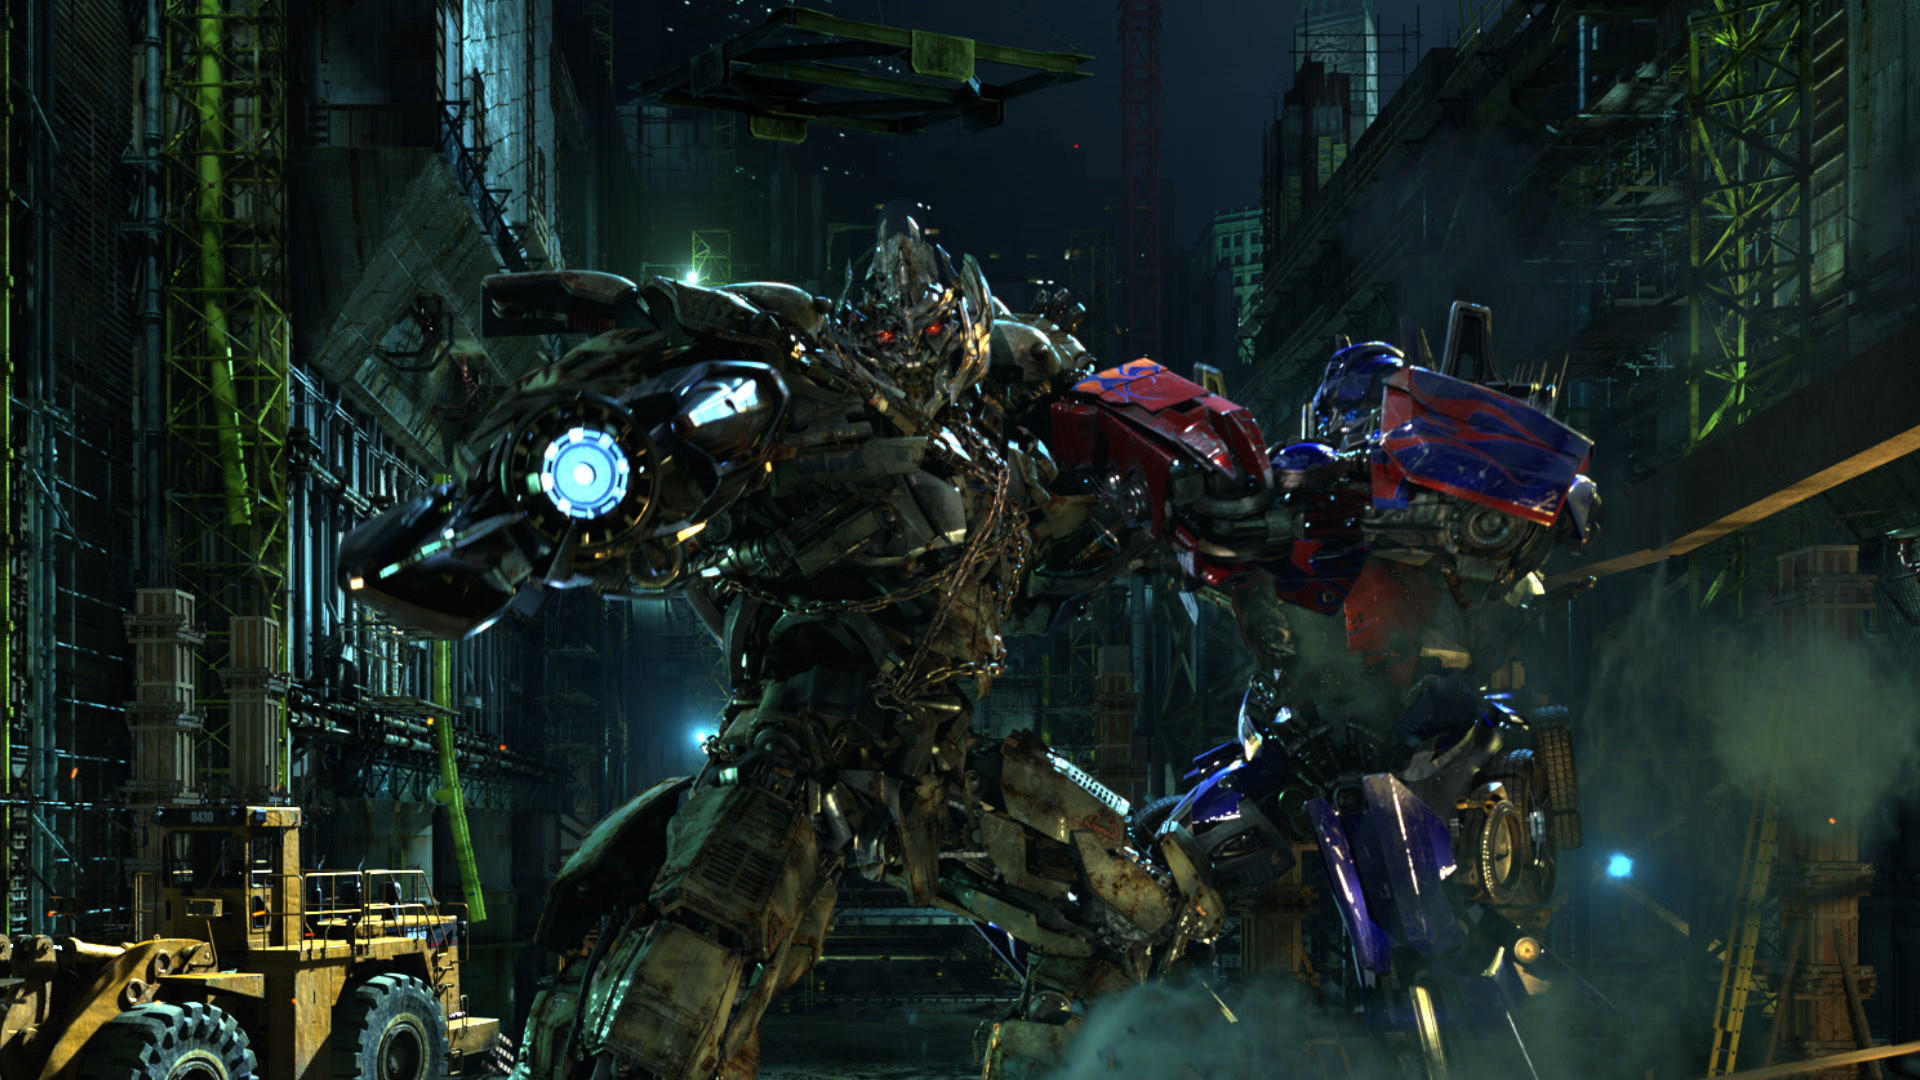 Universal Orlando Simulator Ride Review Transformers The